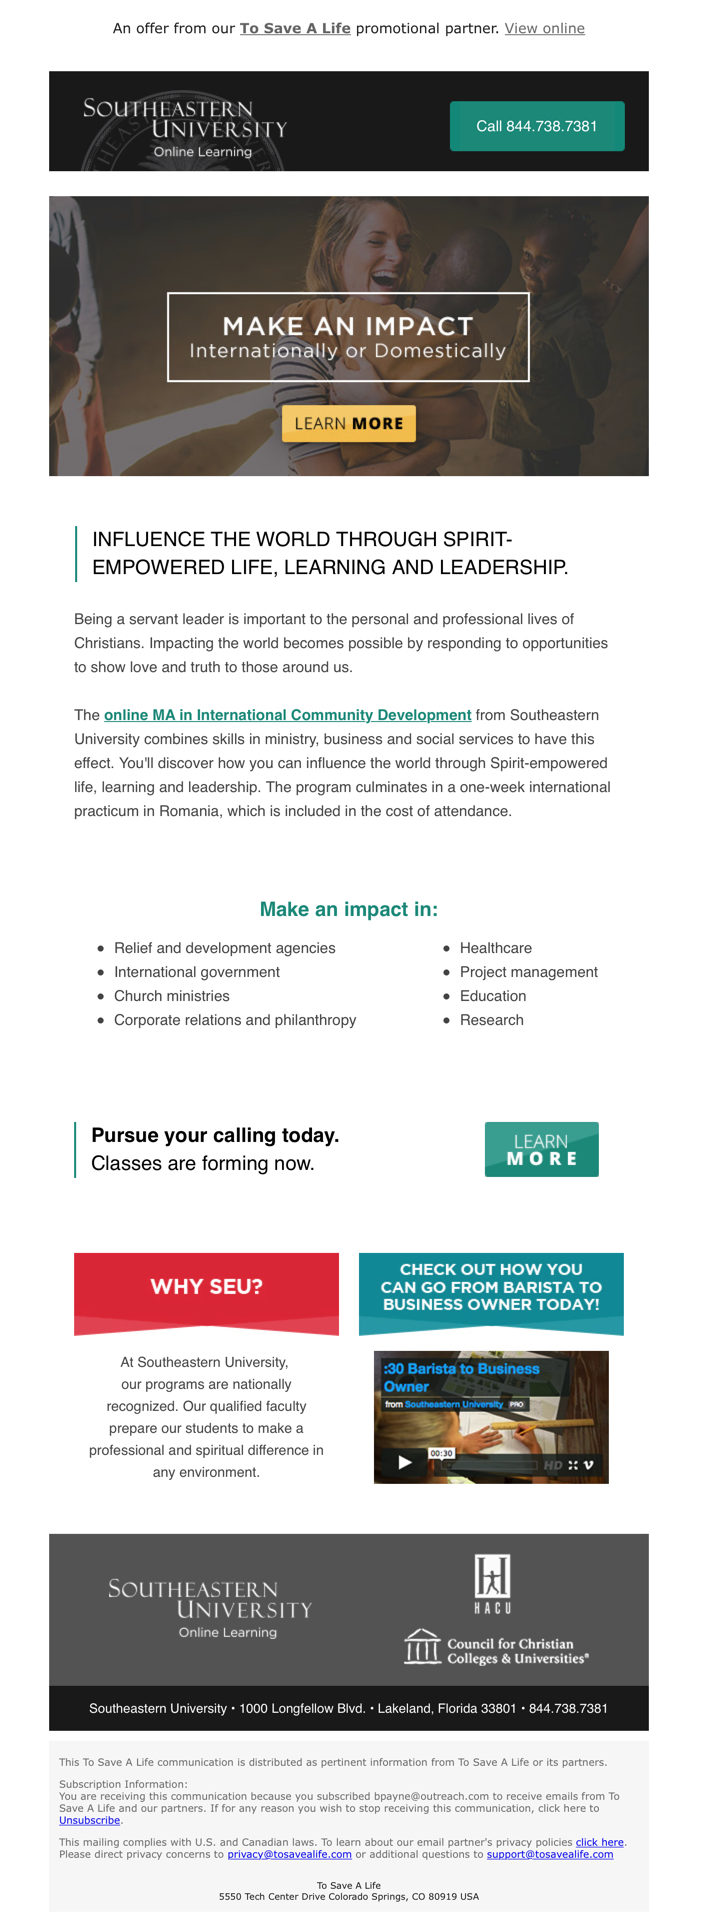 ToSaveALife Email